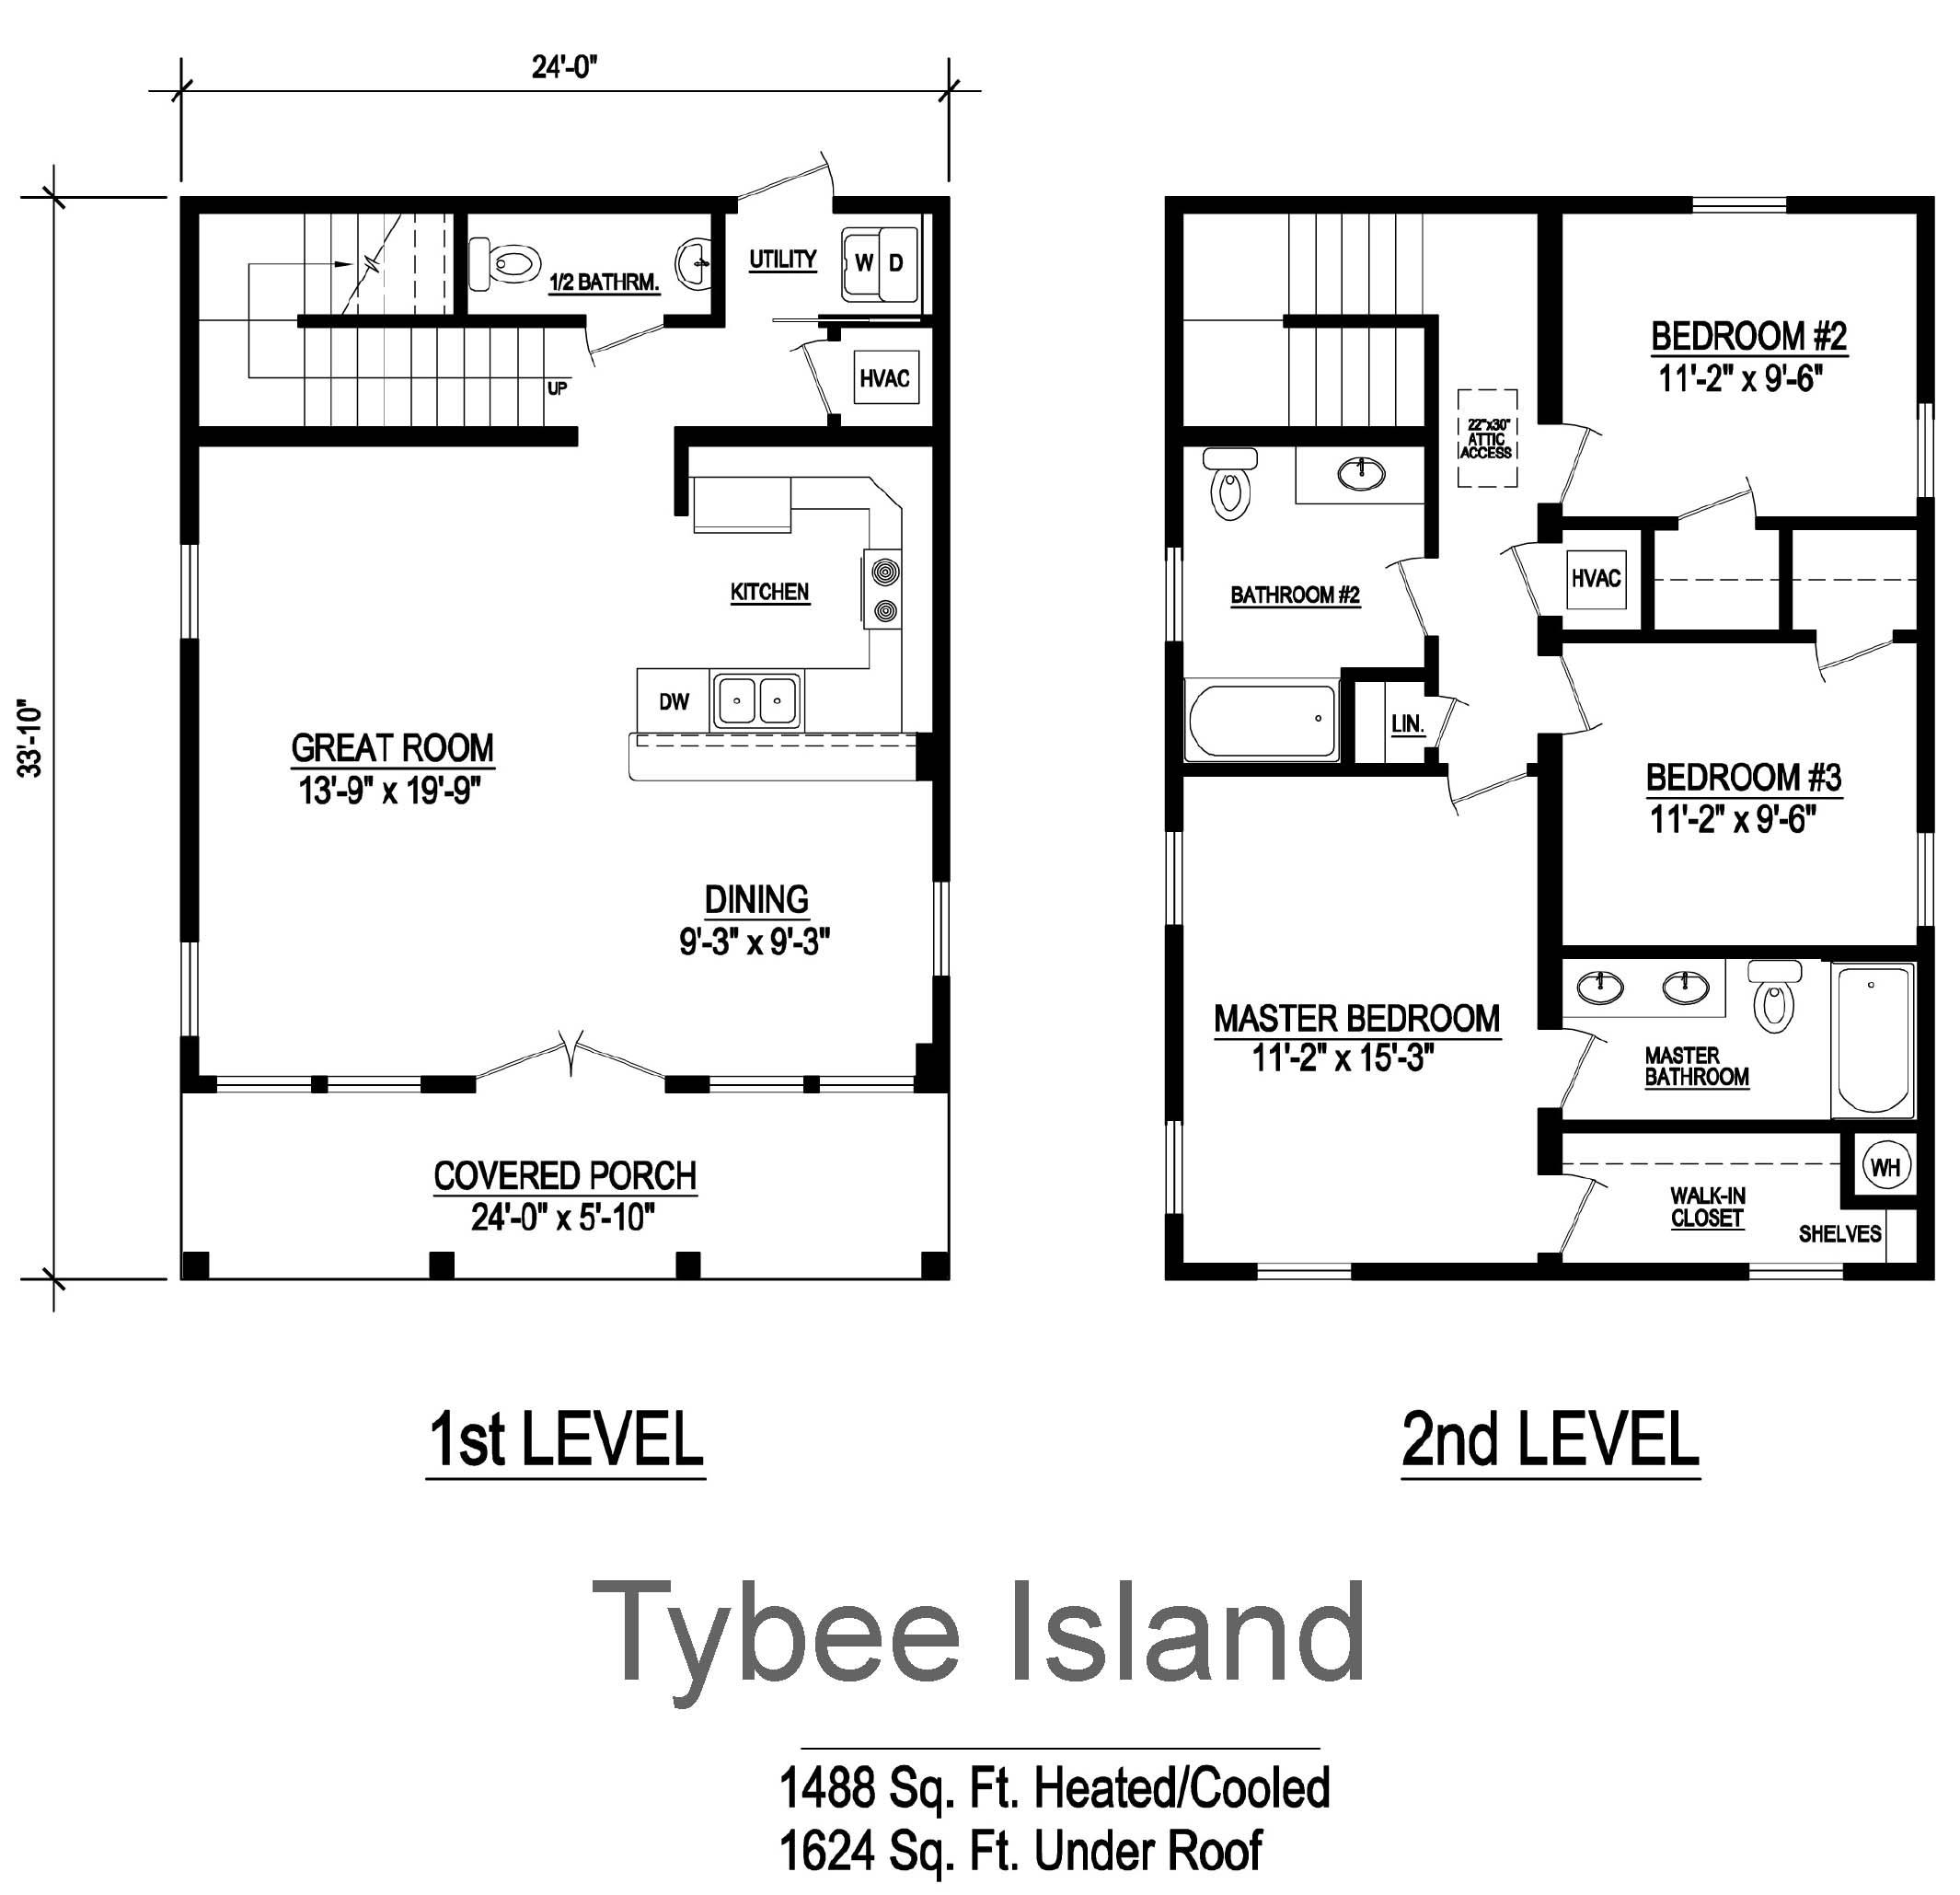 Tybee Island Modular Home Floor Plan